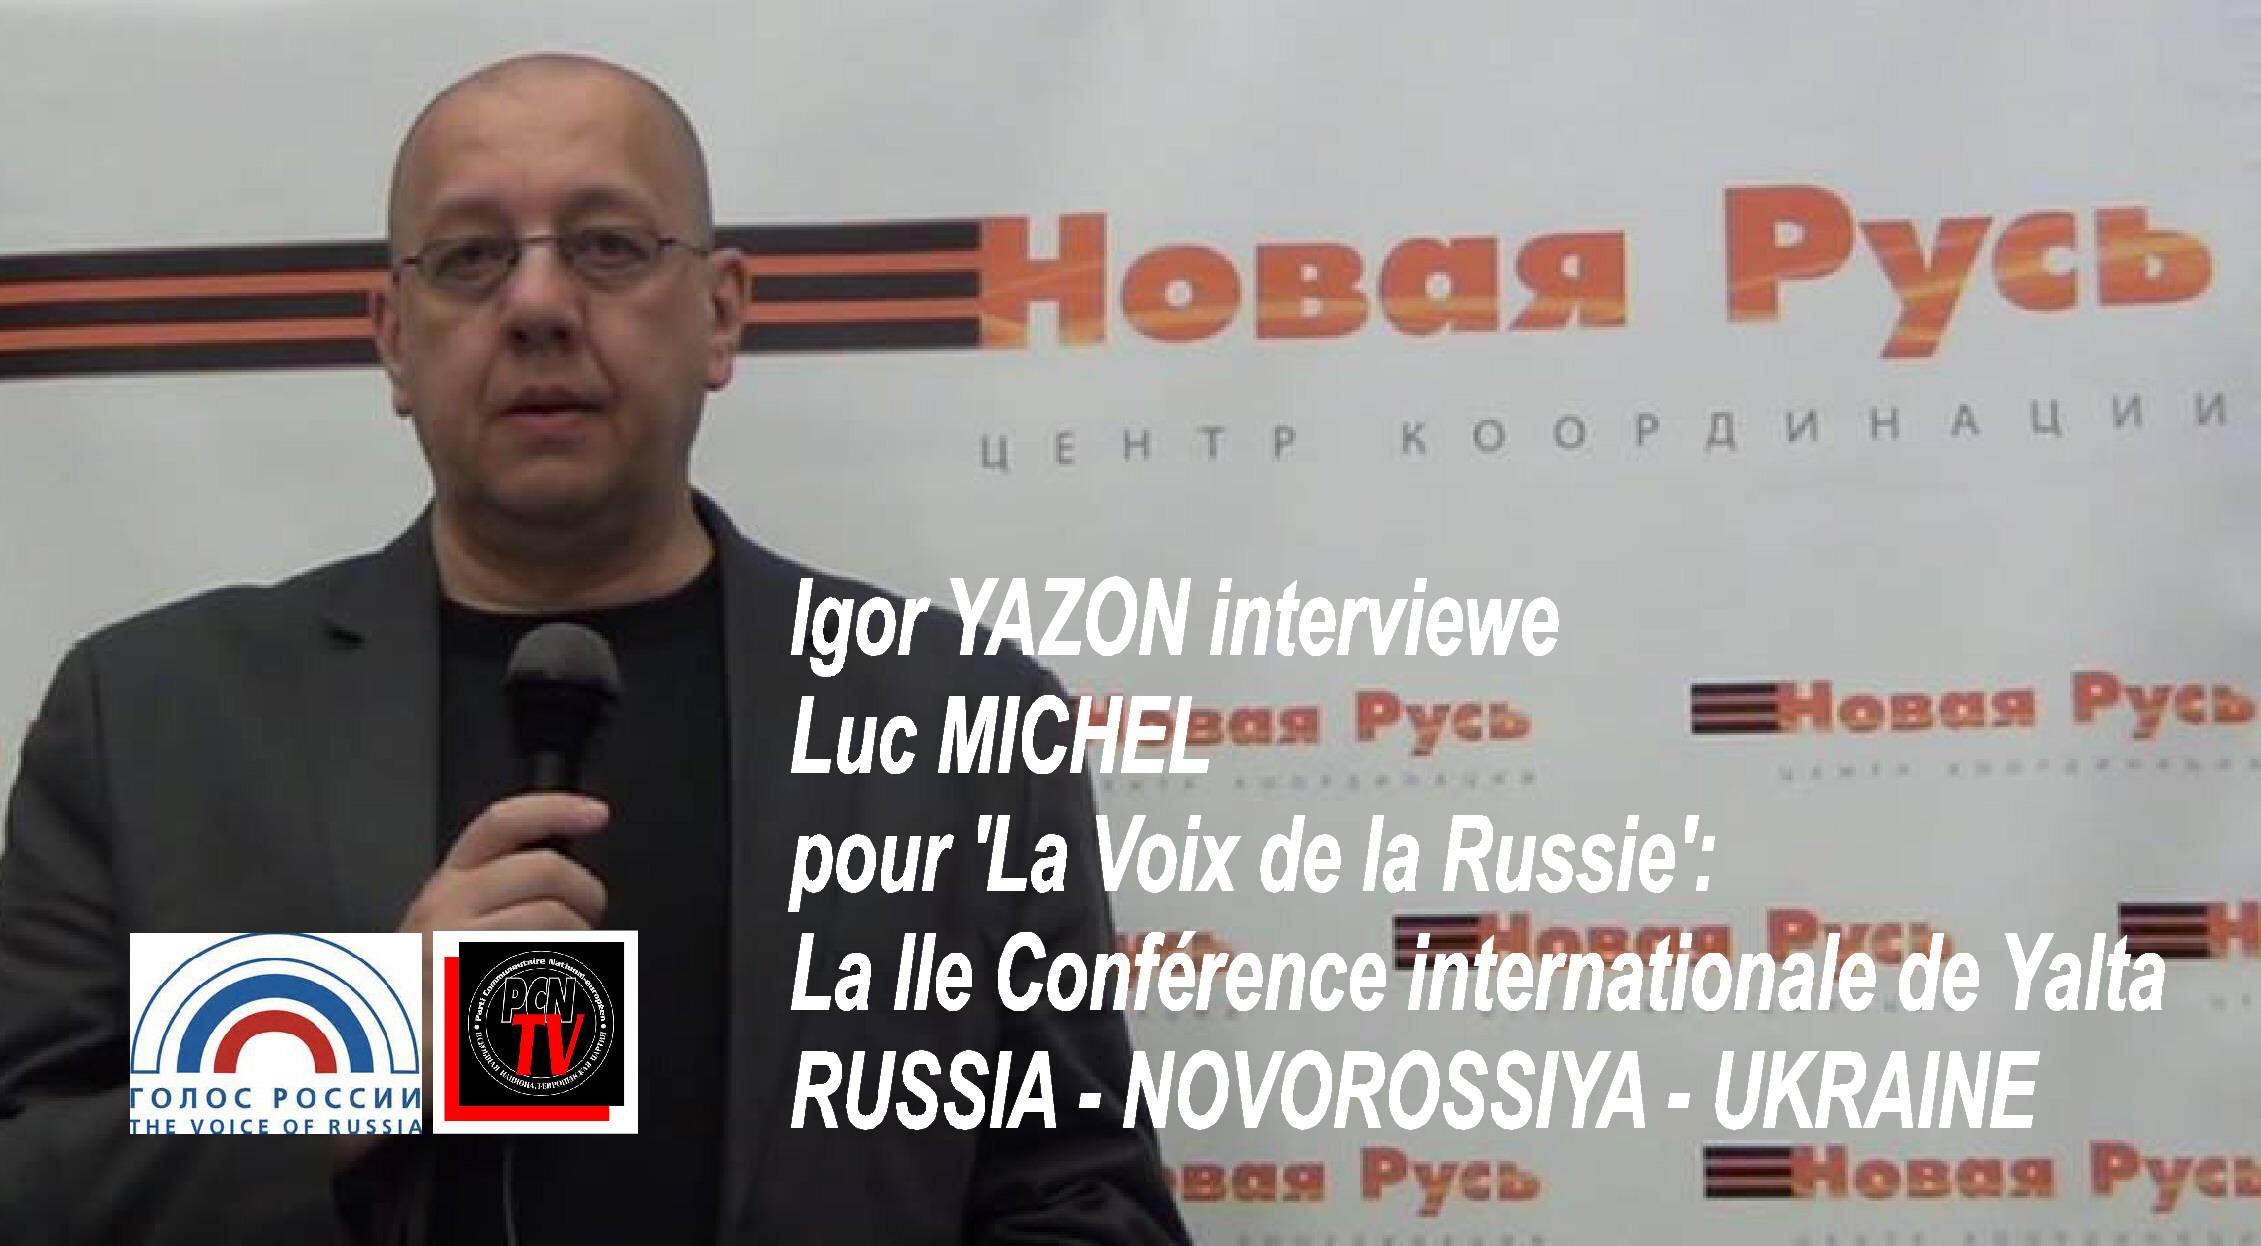 PCN-TV & LVDLR - LM confrence de Yalta (2014 09 02) FR